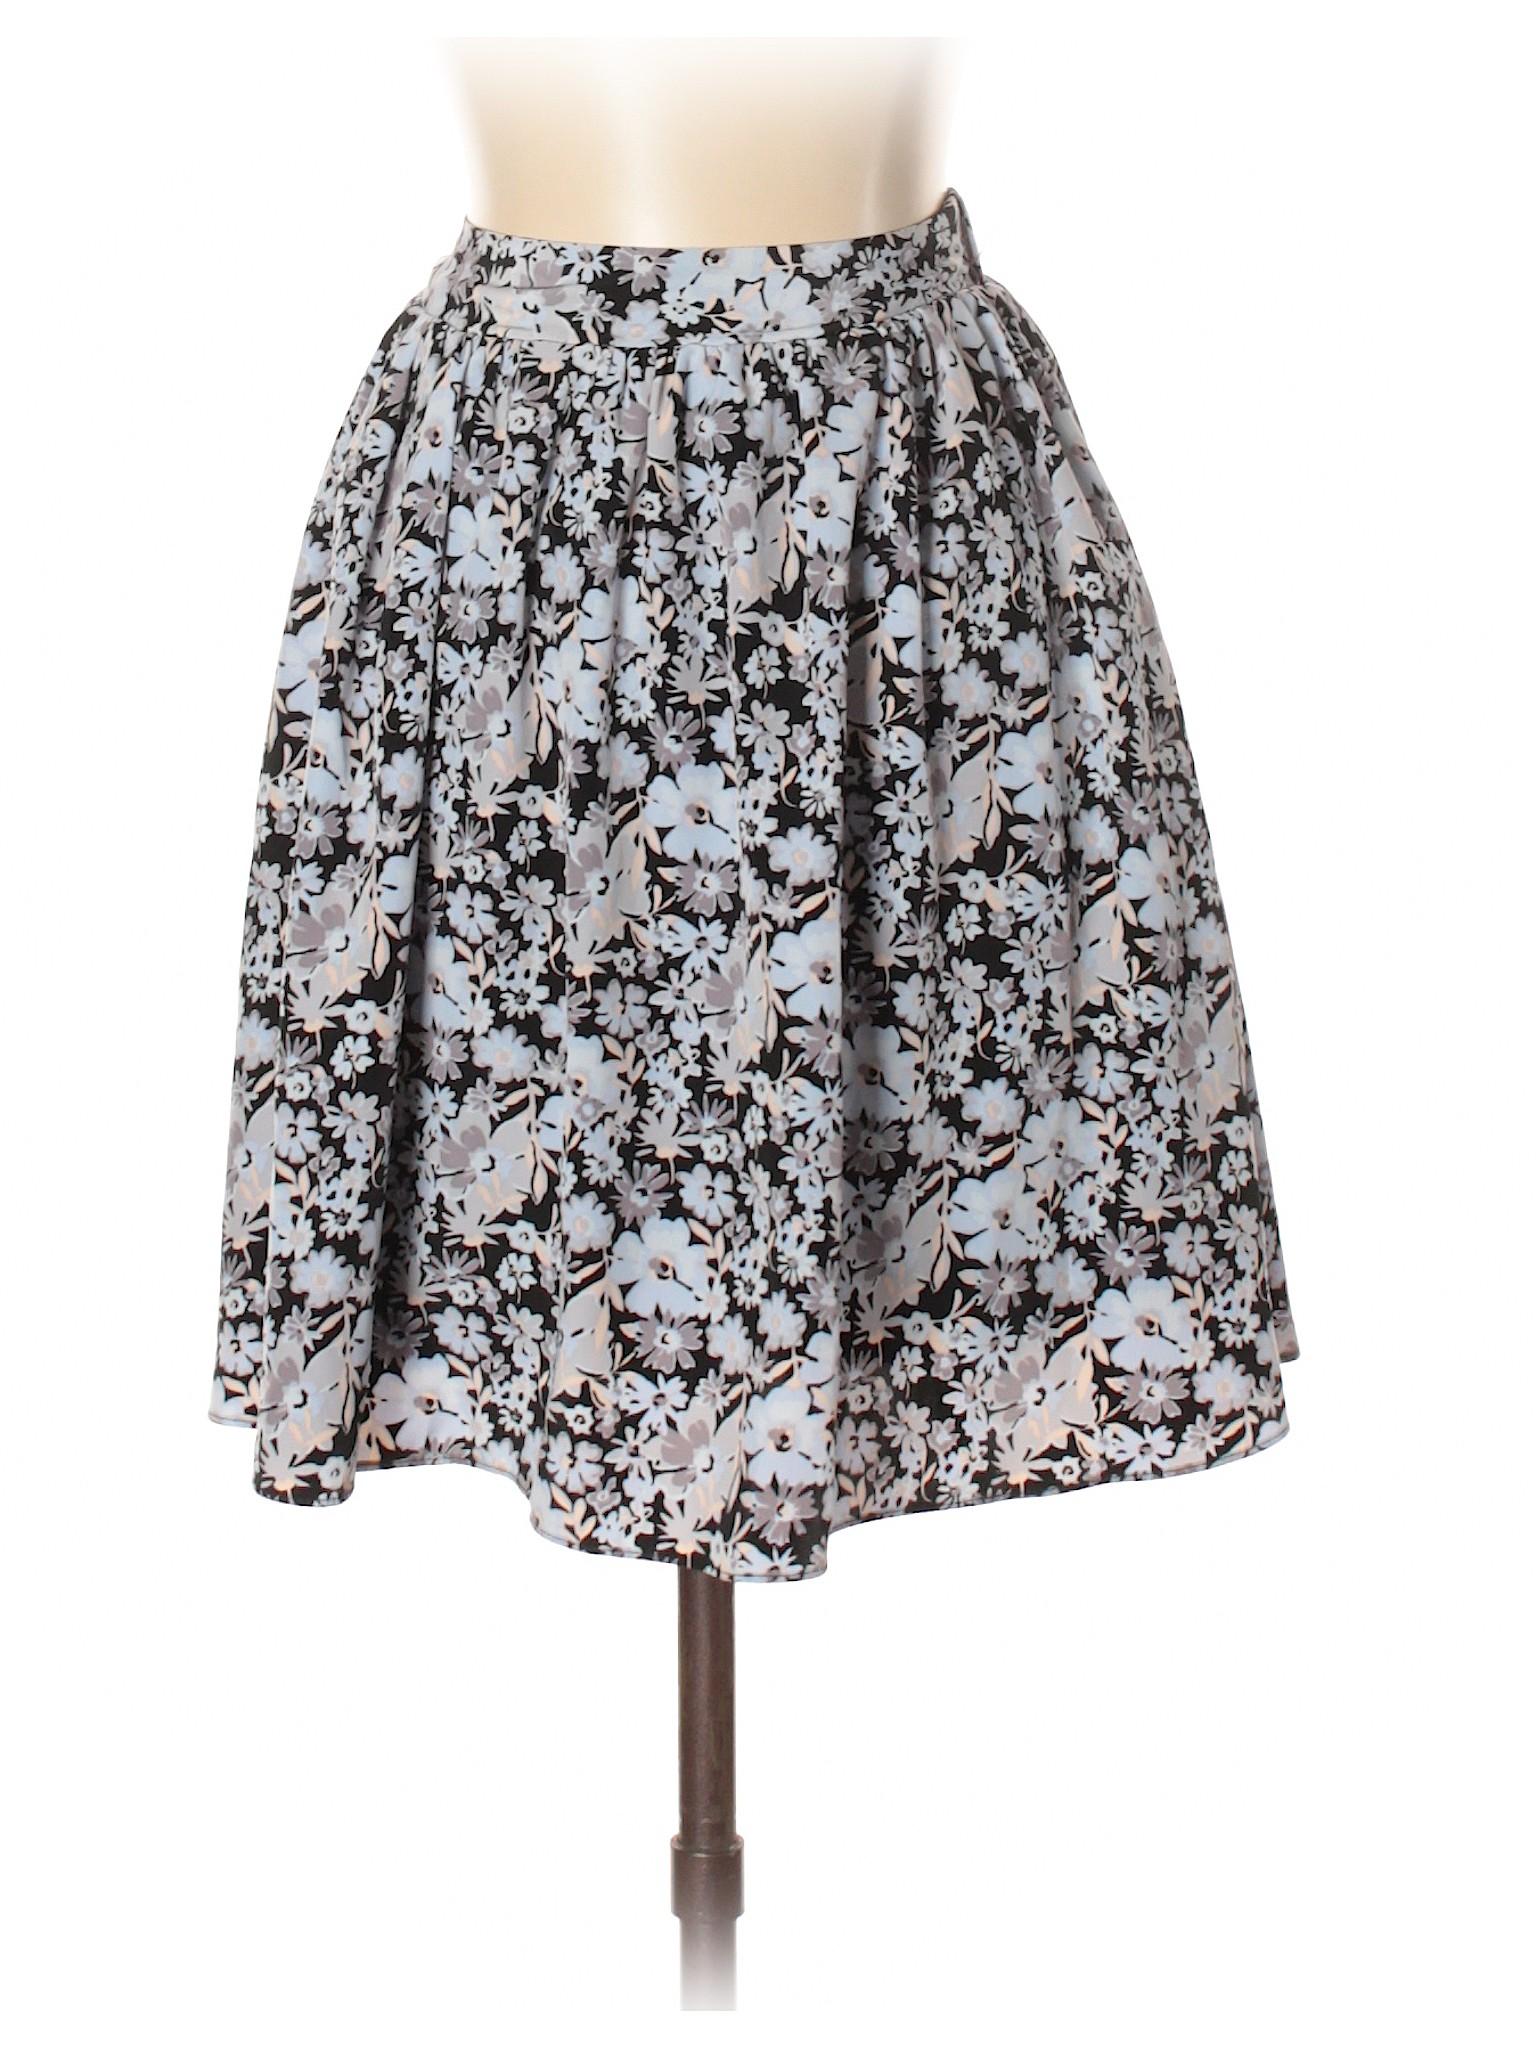 Skirt Lauren LC Casual Conrad Boutique wzXxq4aPz